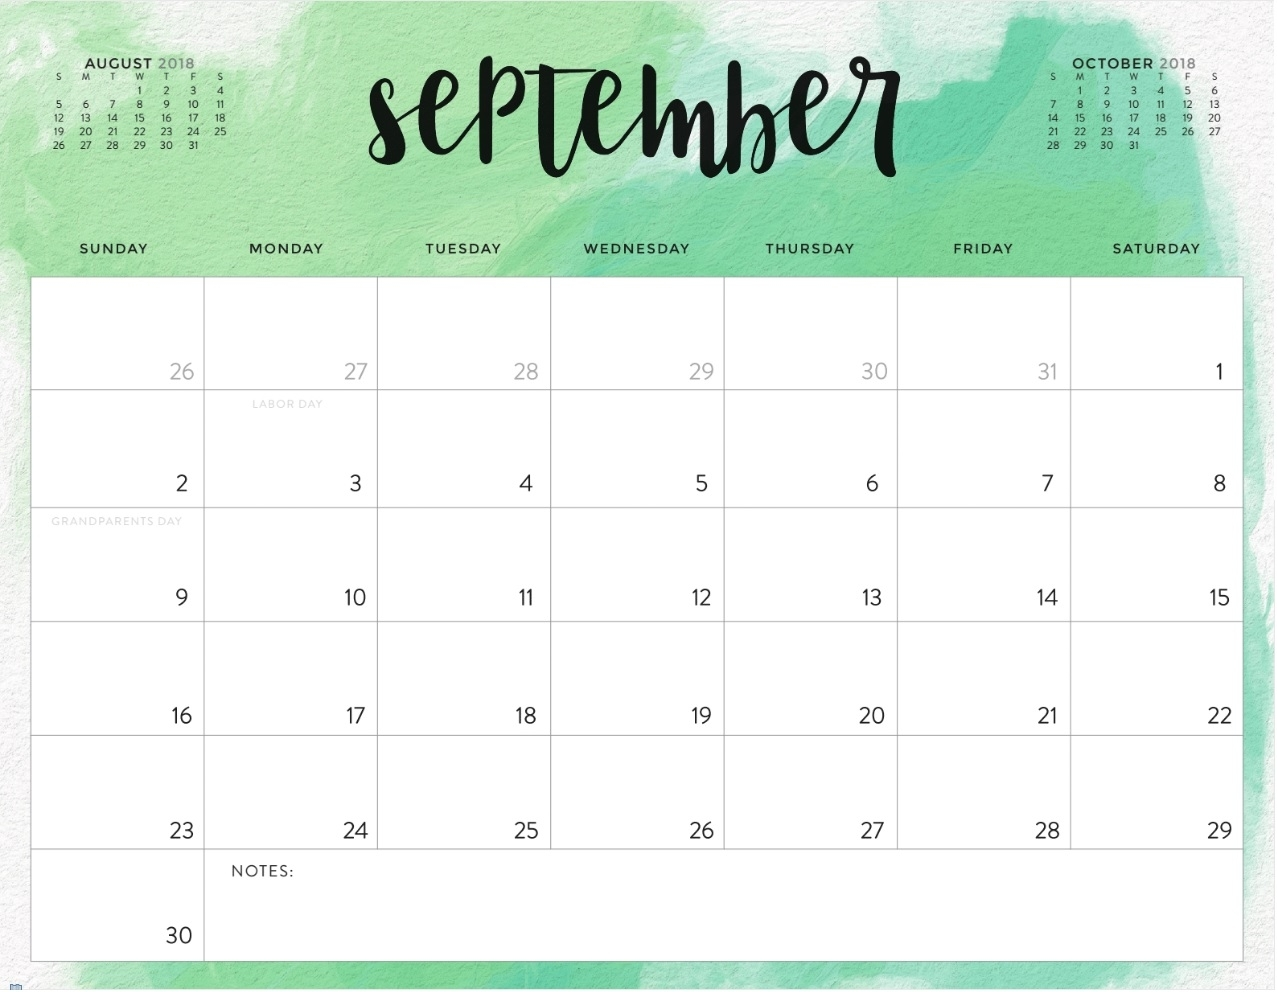 September 2018 Printable Calendar Word Template- September 2018 with regard to Free Printable Calendars 2020 Waterproof